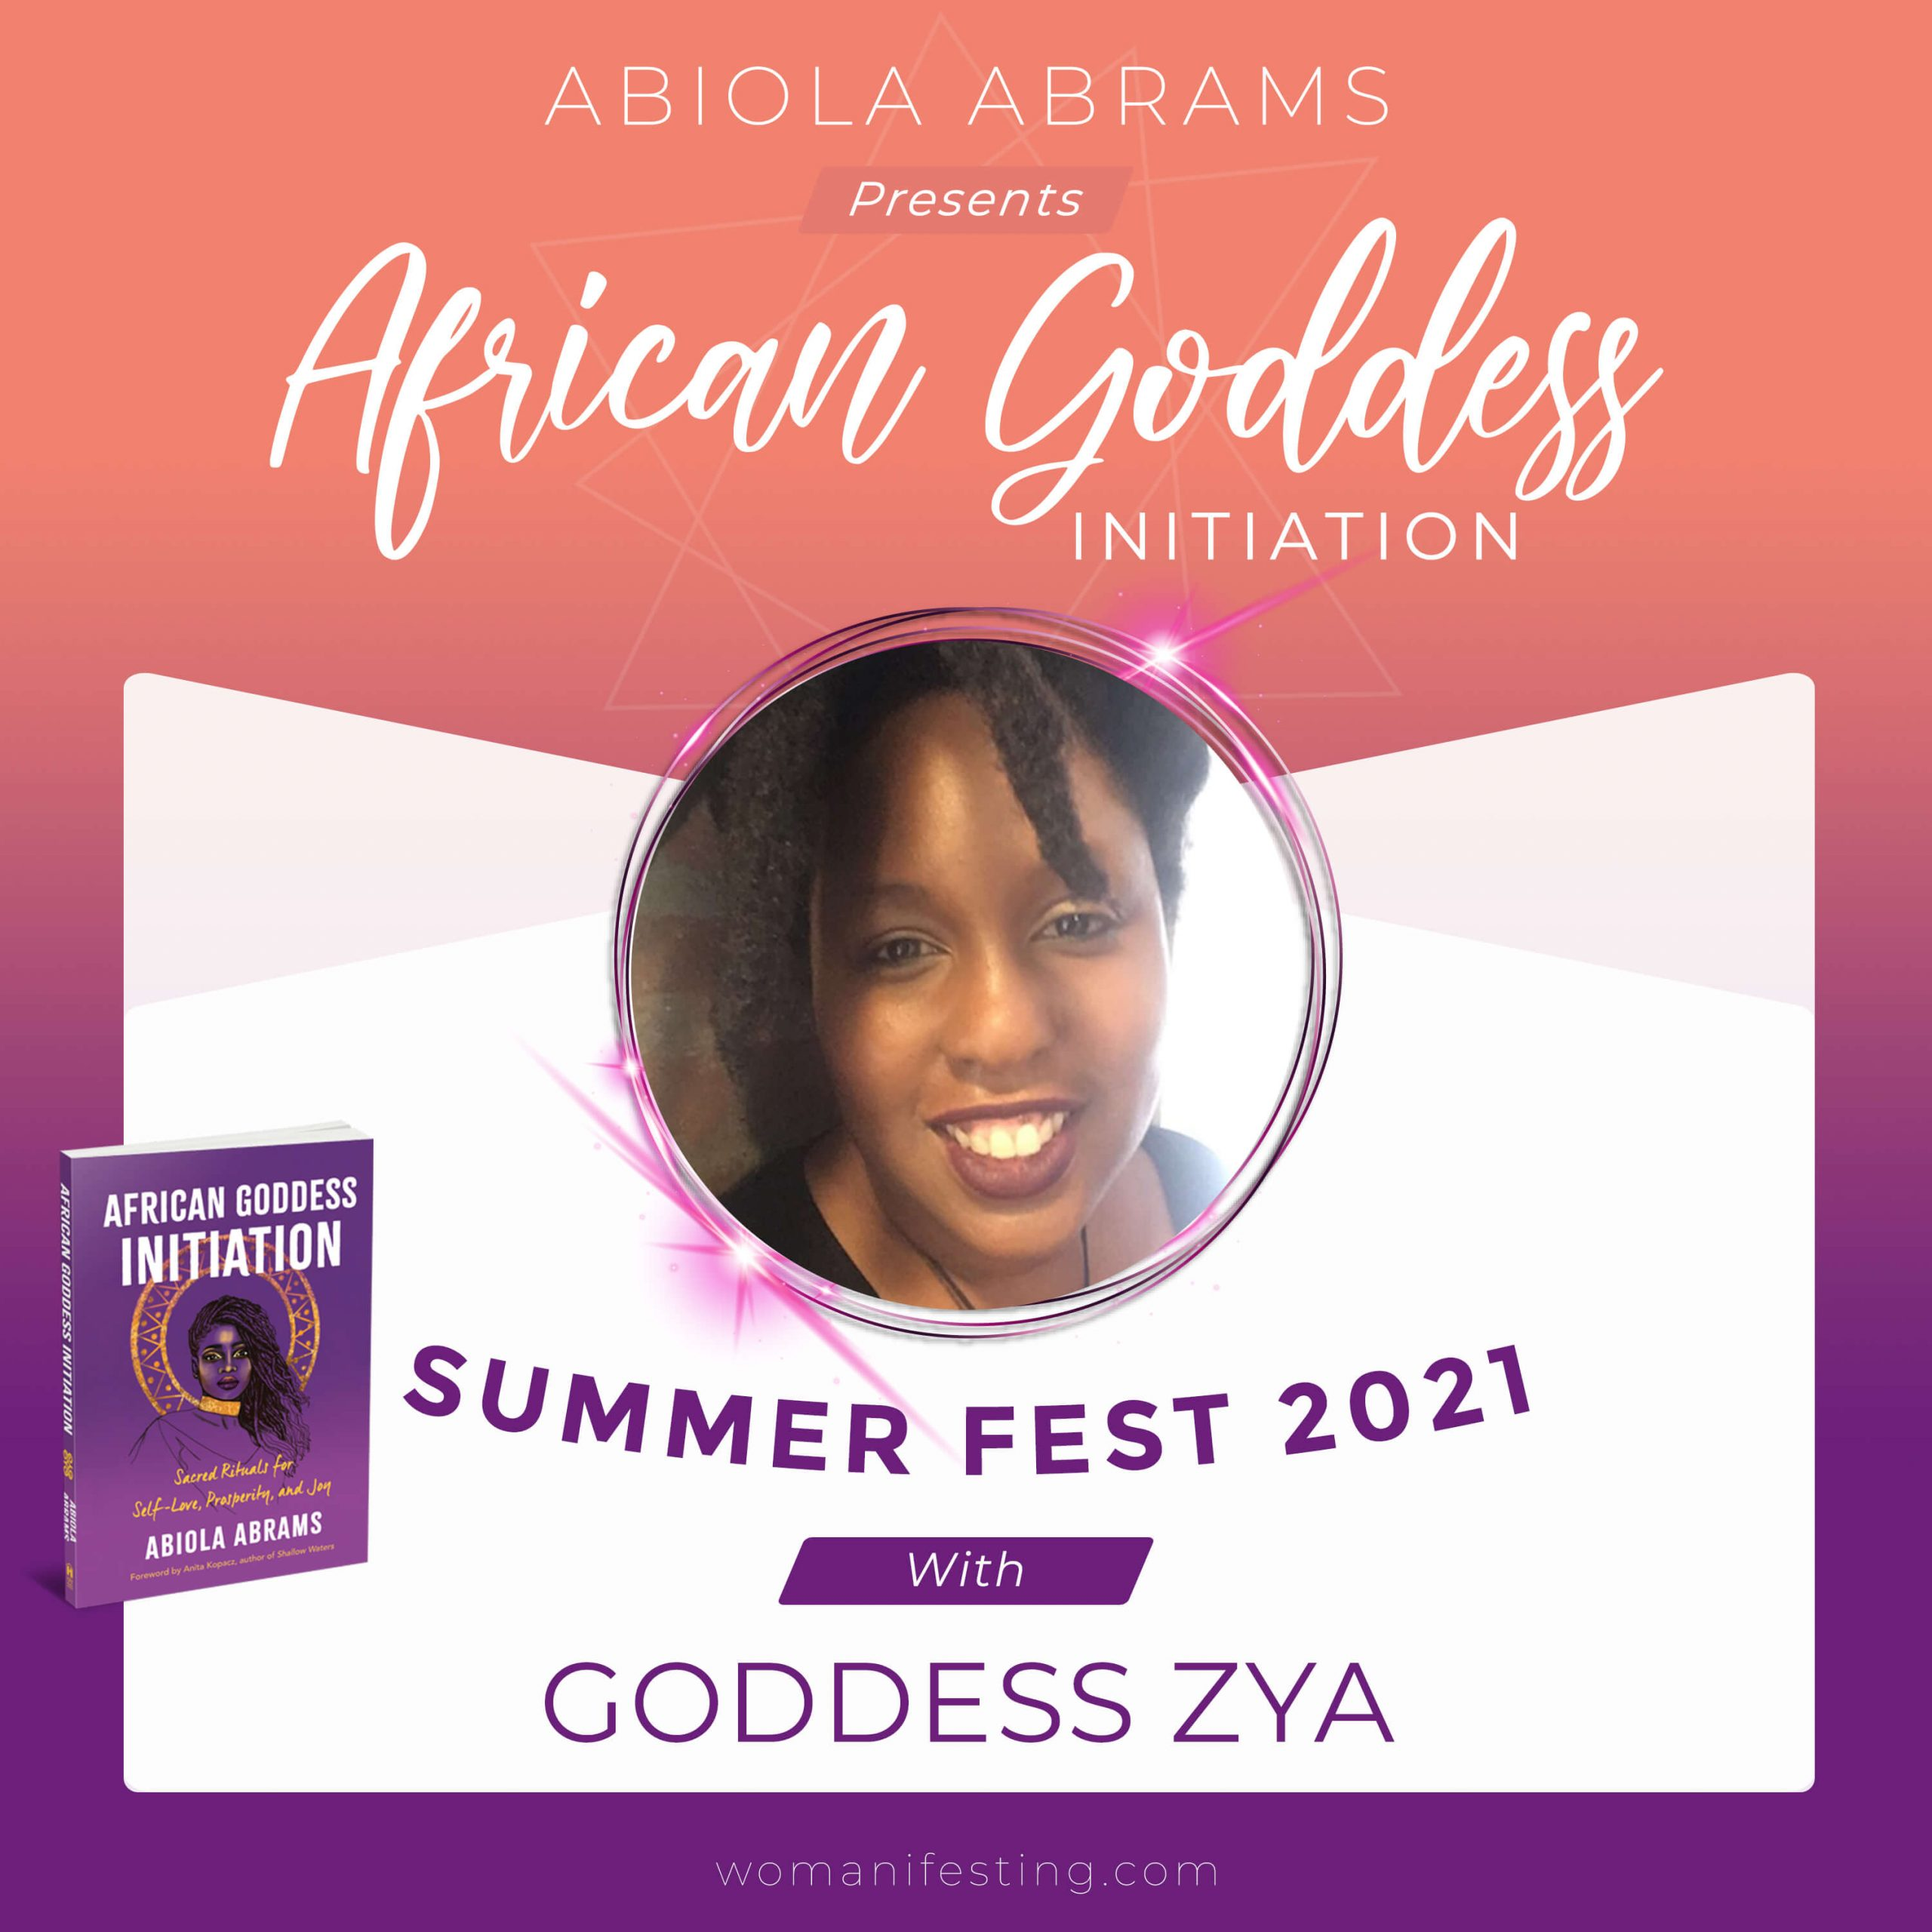 Goddess Zya: African Goddess Initiation Fest Guru